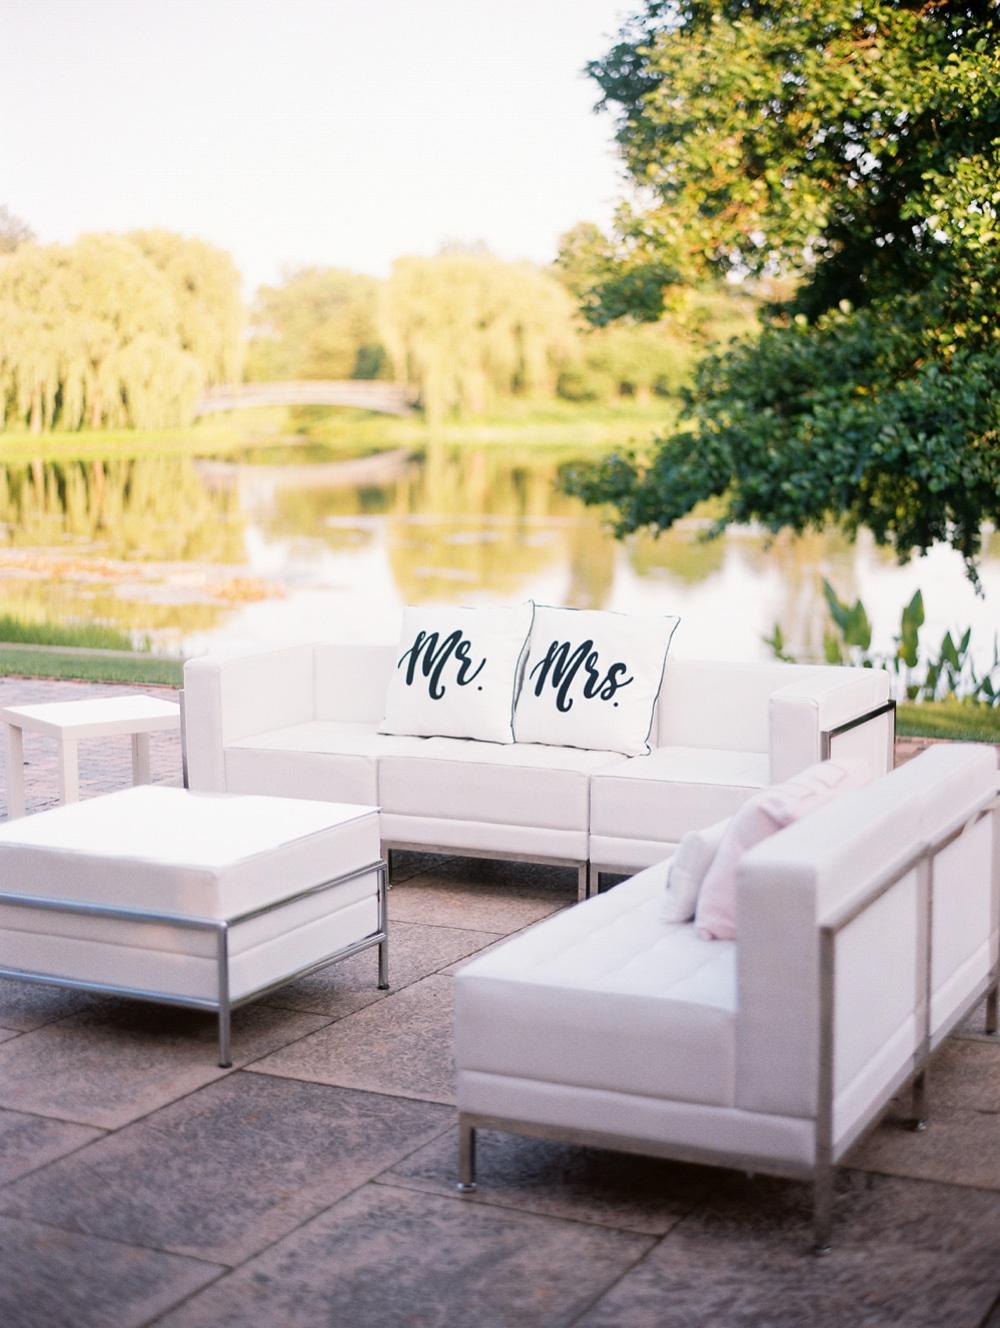 Kristin-La-Voie-Photography-chicago-botanic-garden-wedding-photos-2